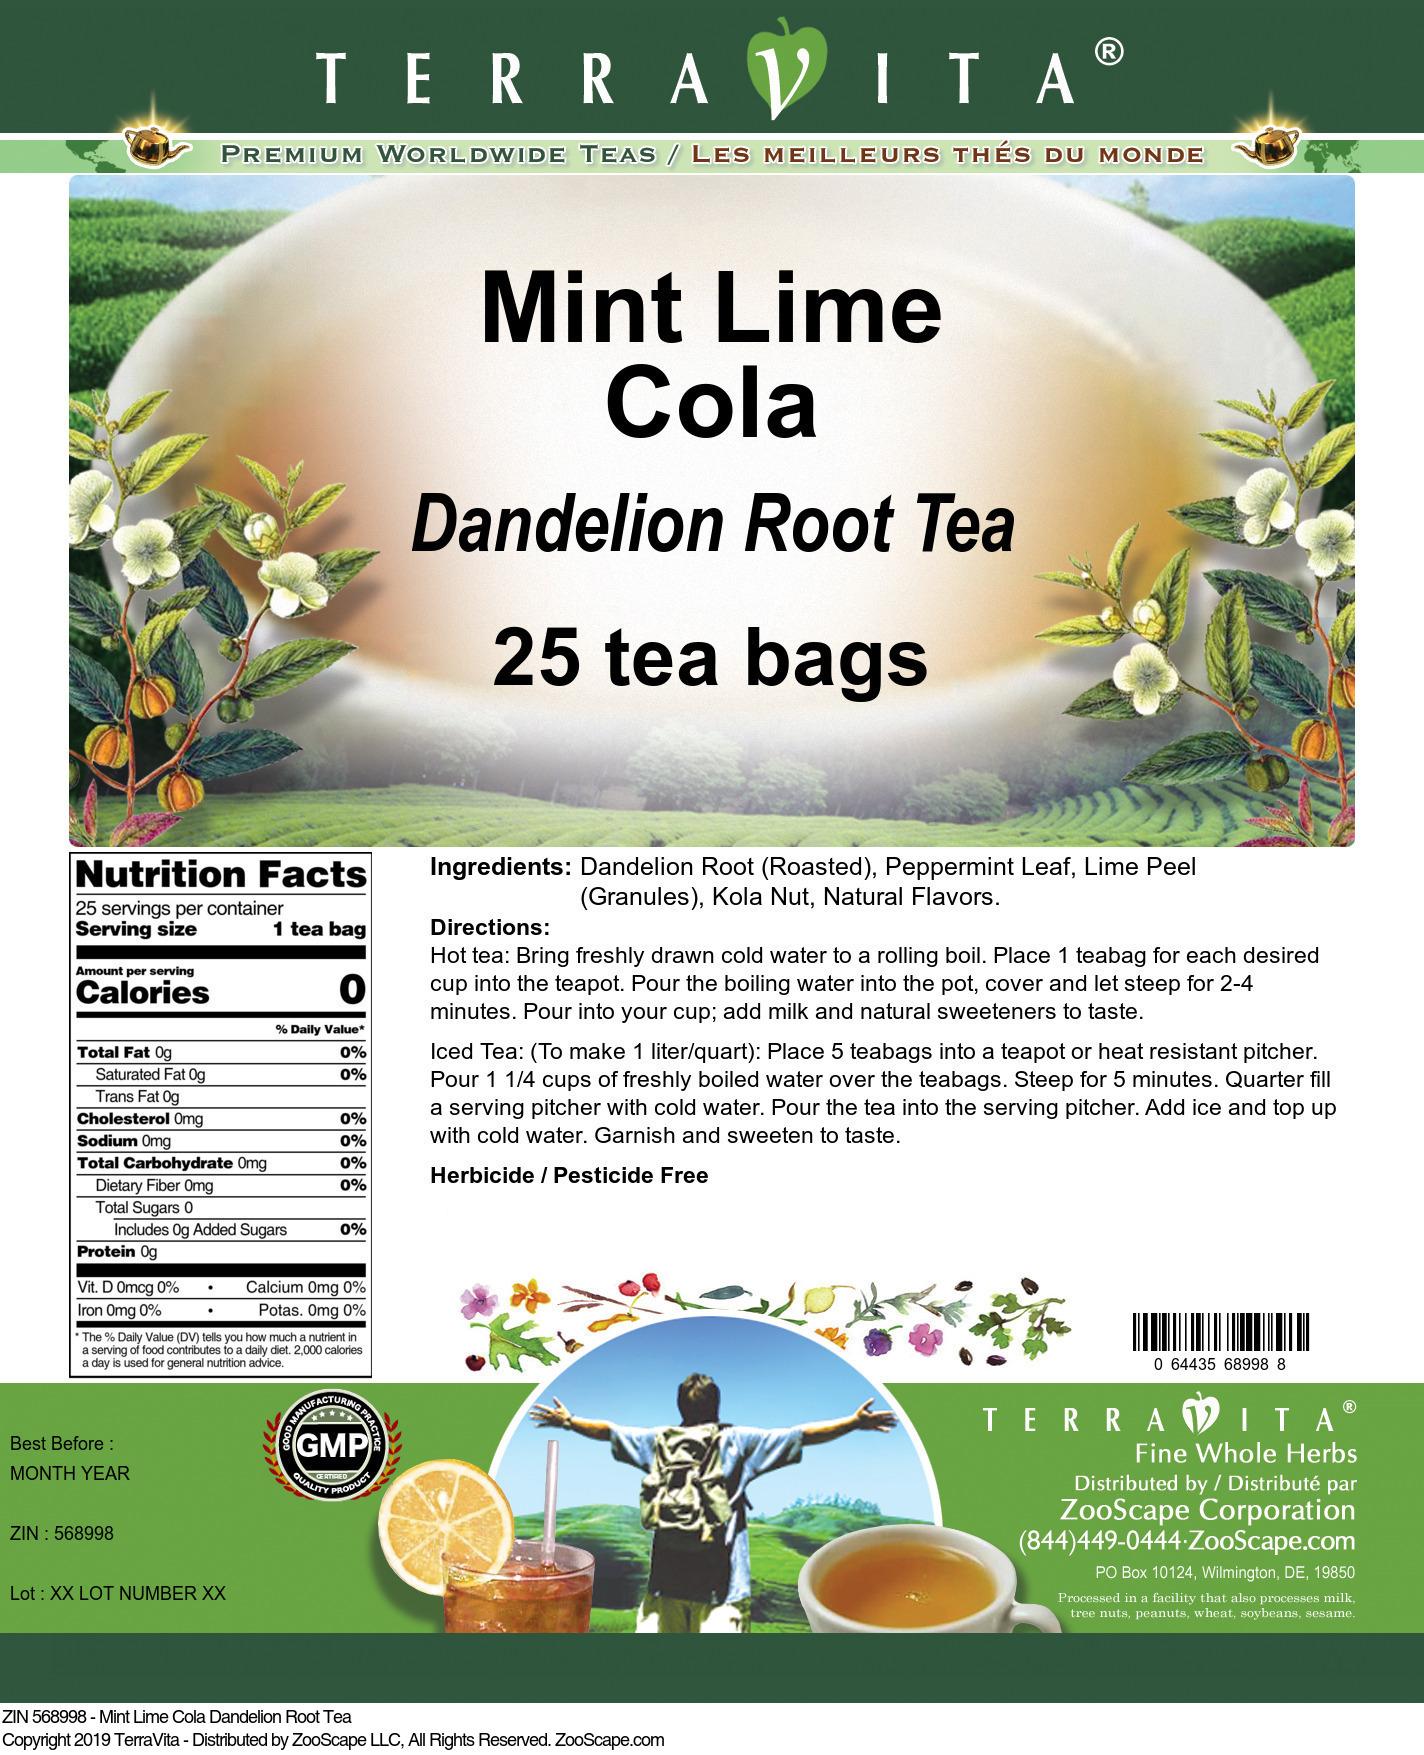 Mint Lime Cola Dandelion Root